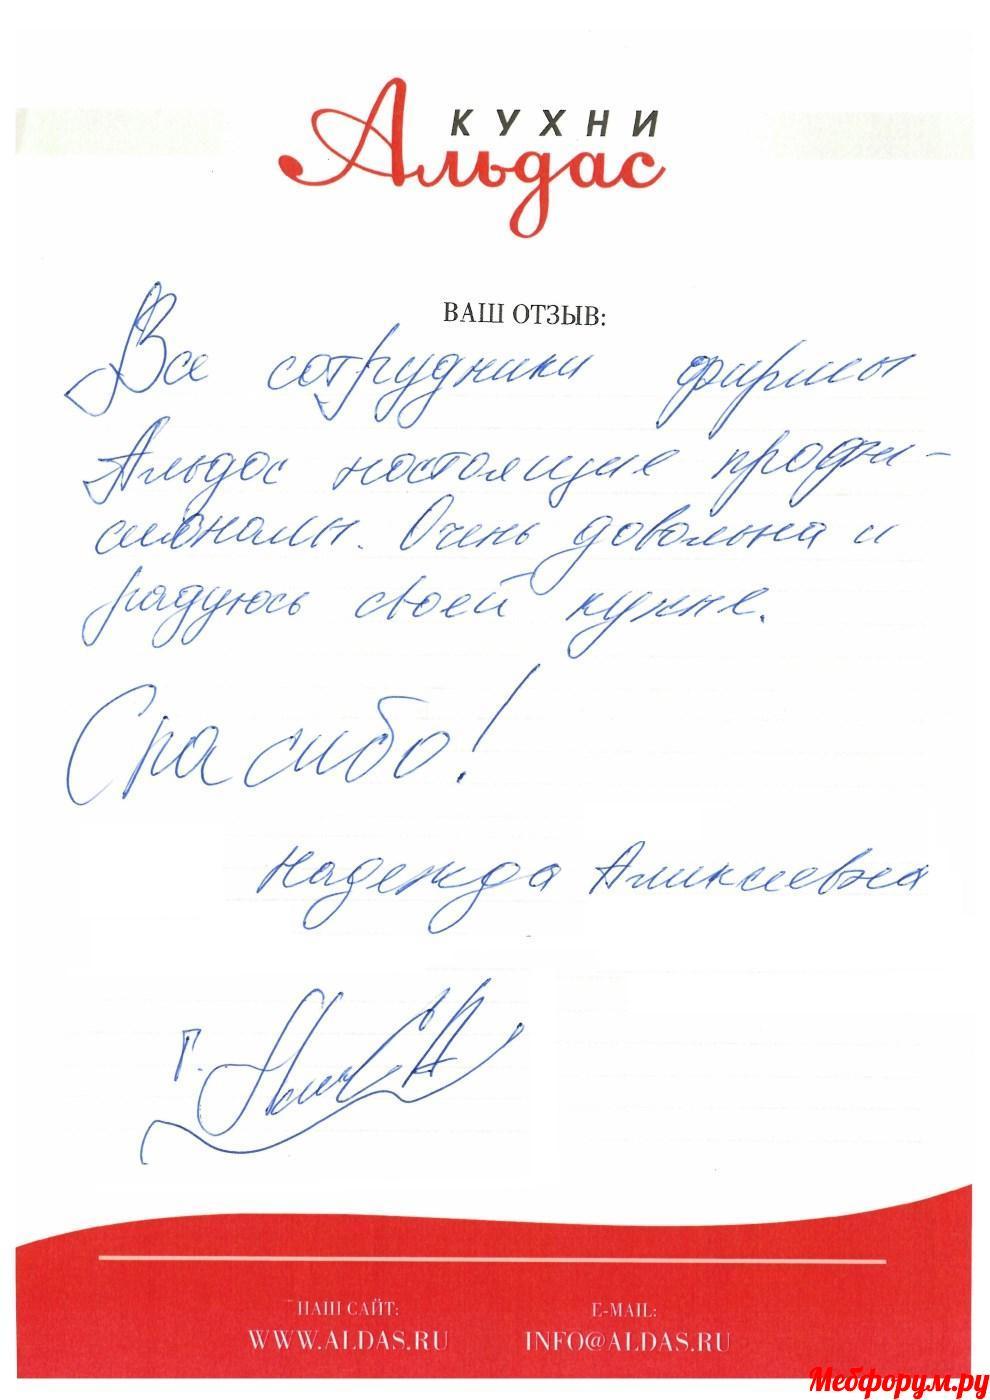 Otziv-aldas-1.jpg